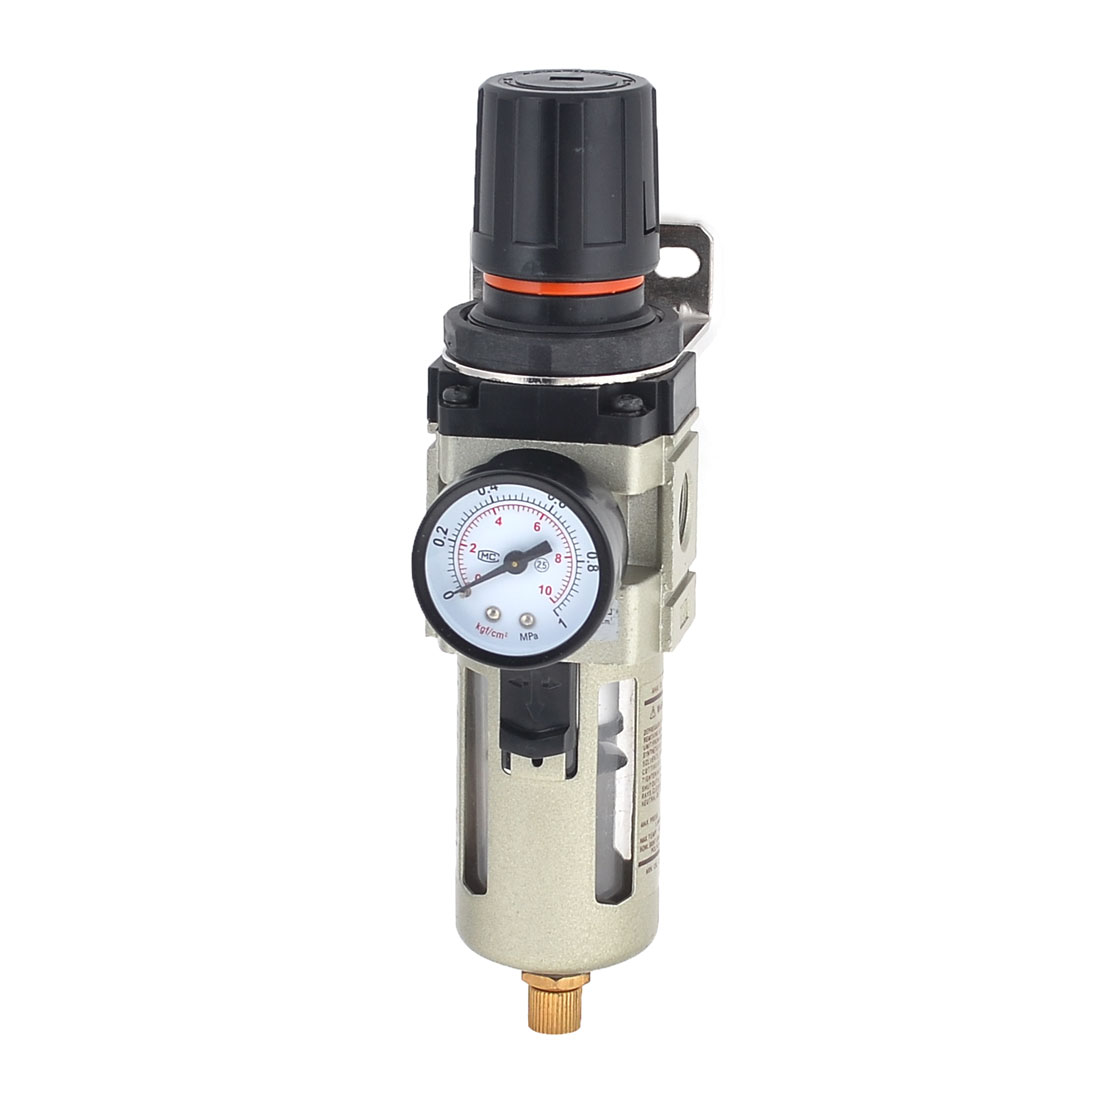 1.0MPa 10.2kgf/cm2 Pneumatic Pressure Reducing Regulator w Bracket